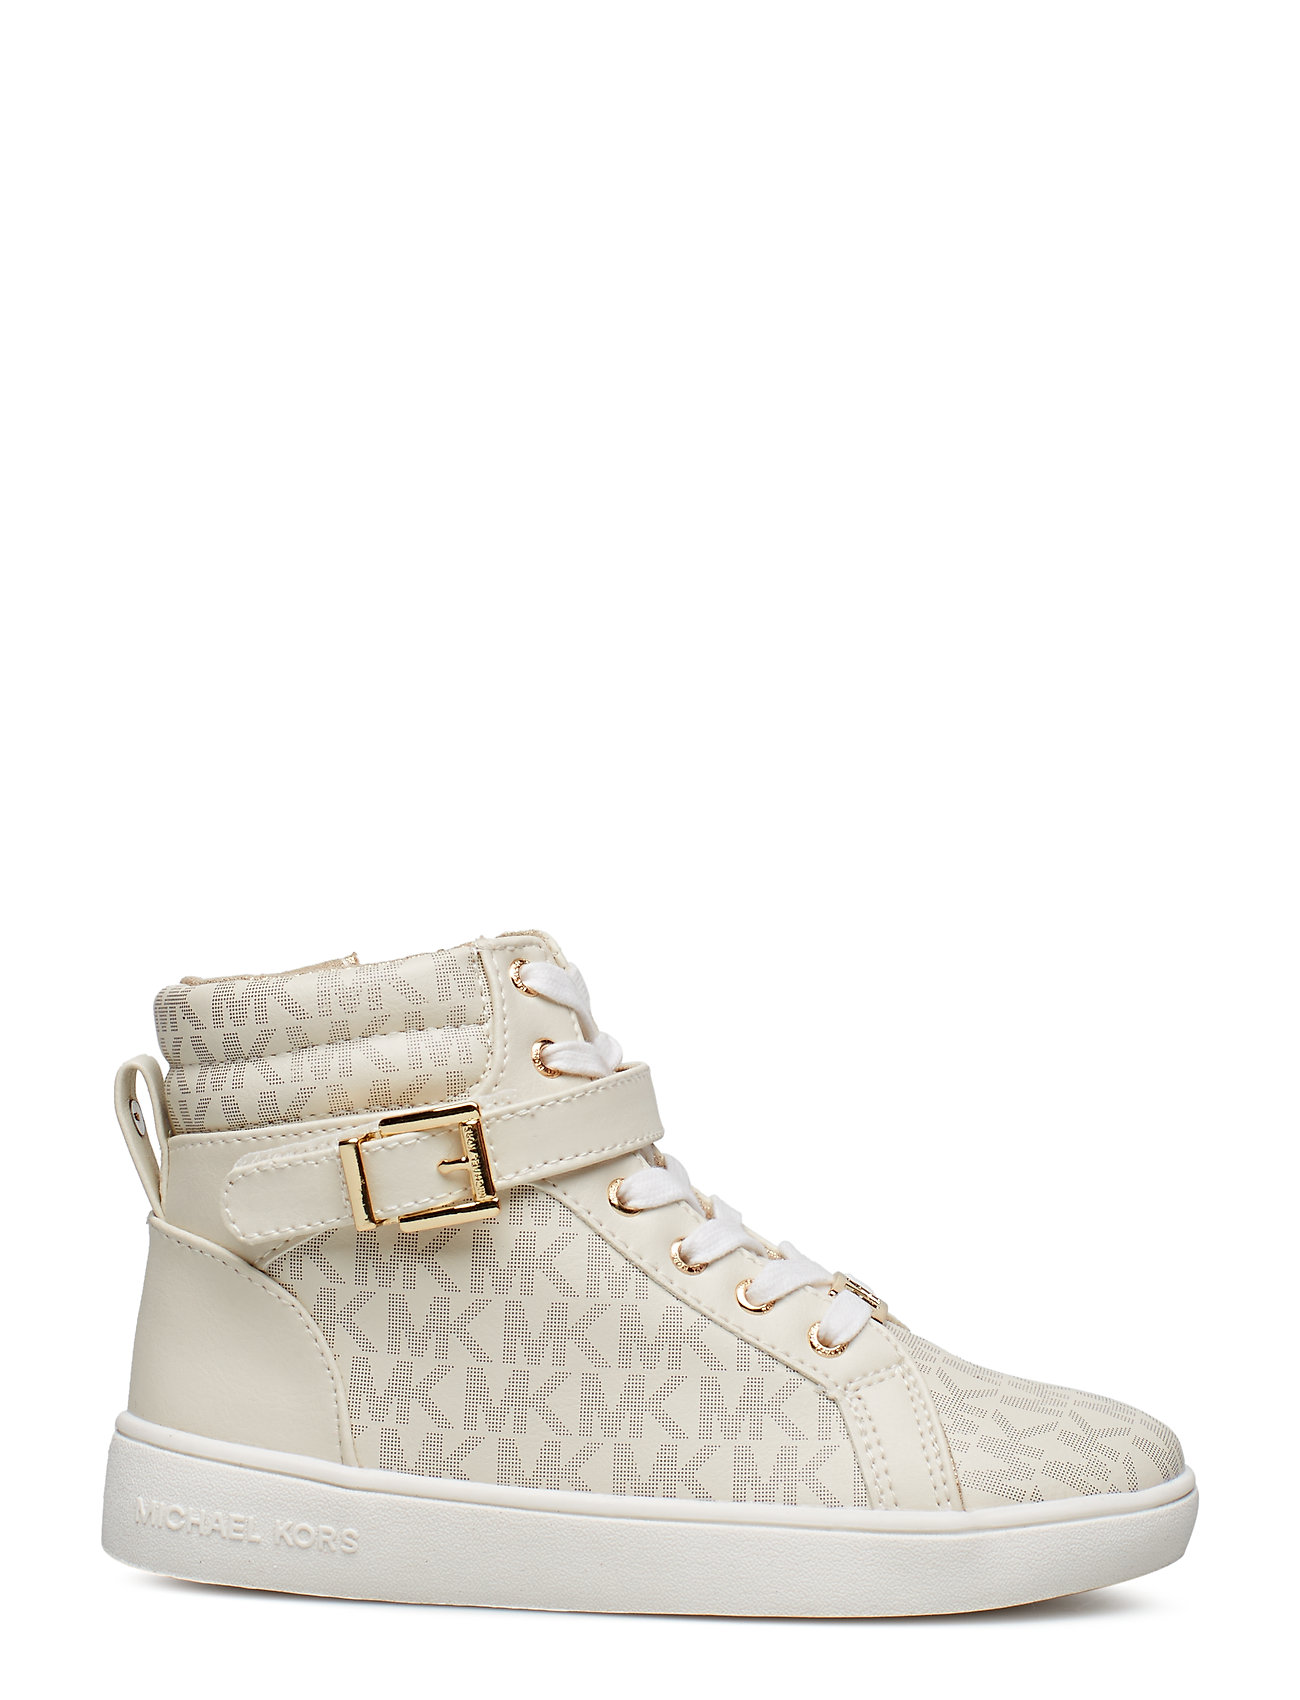 91c2c8c5 Vanilla Michael Kors Zia Ivy Abbigail sneakers for børn - Pashion.dk